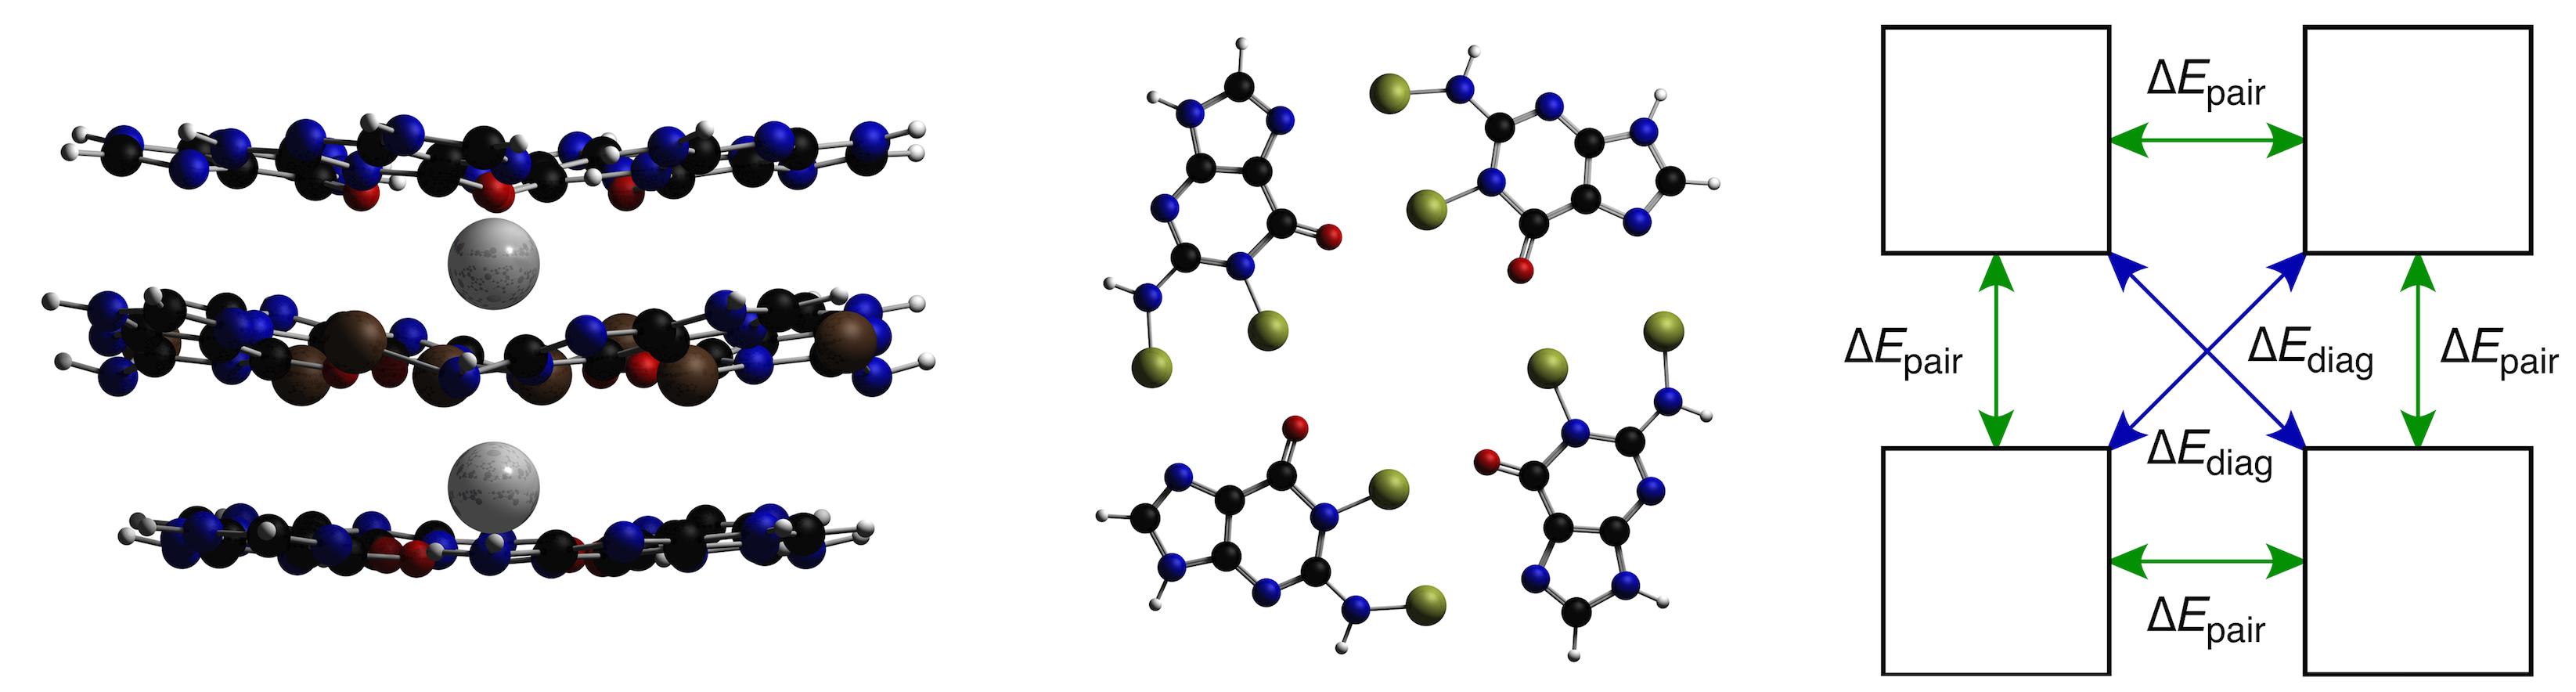 Cooperative Halogen Bonding in Guanine Quartets